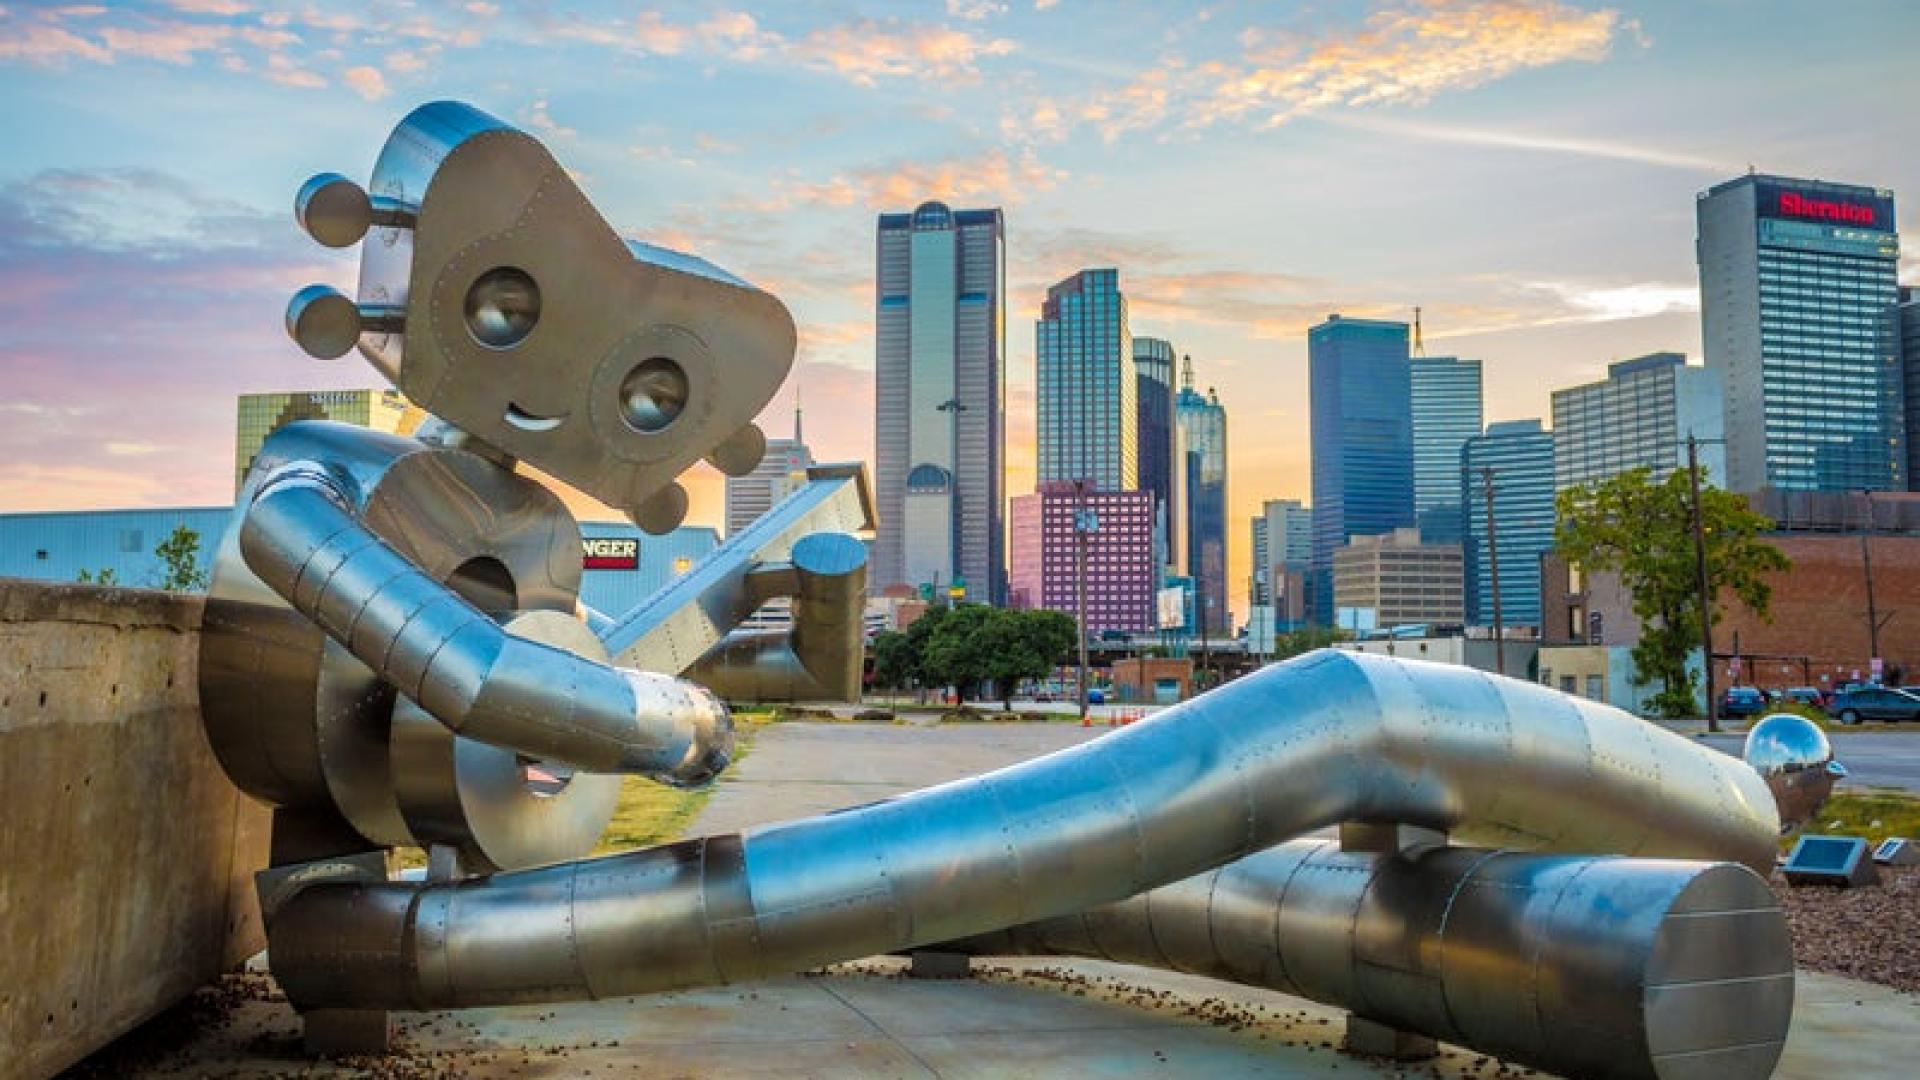 Art in Dallas's Deep Ellum district